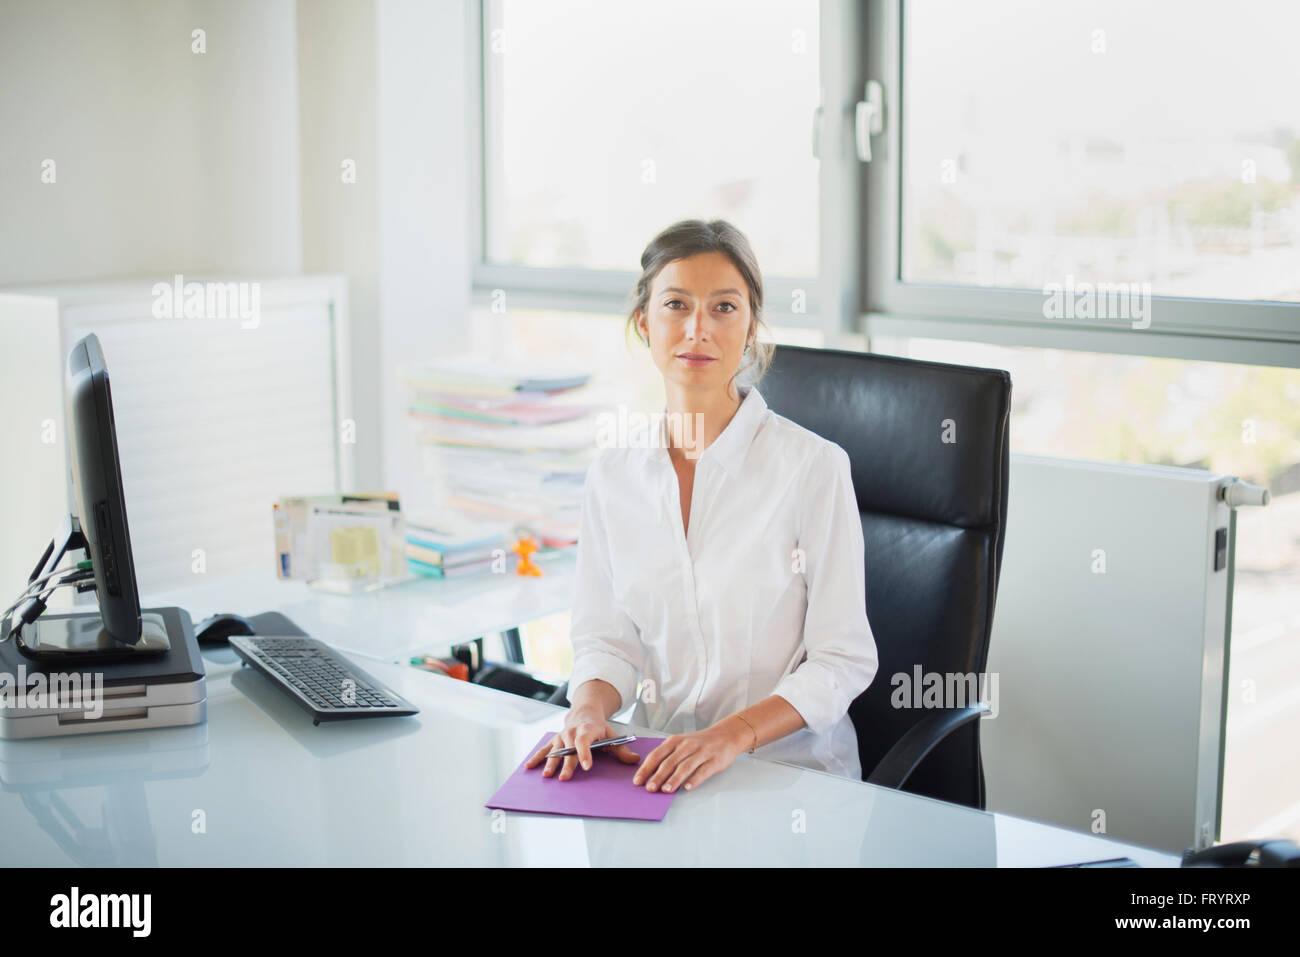 Femme manager looking at camera dans son bureau blanc femme assise